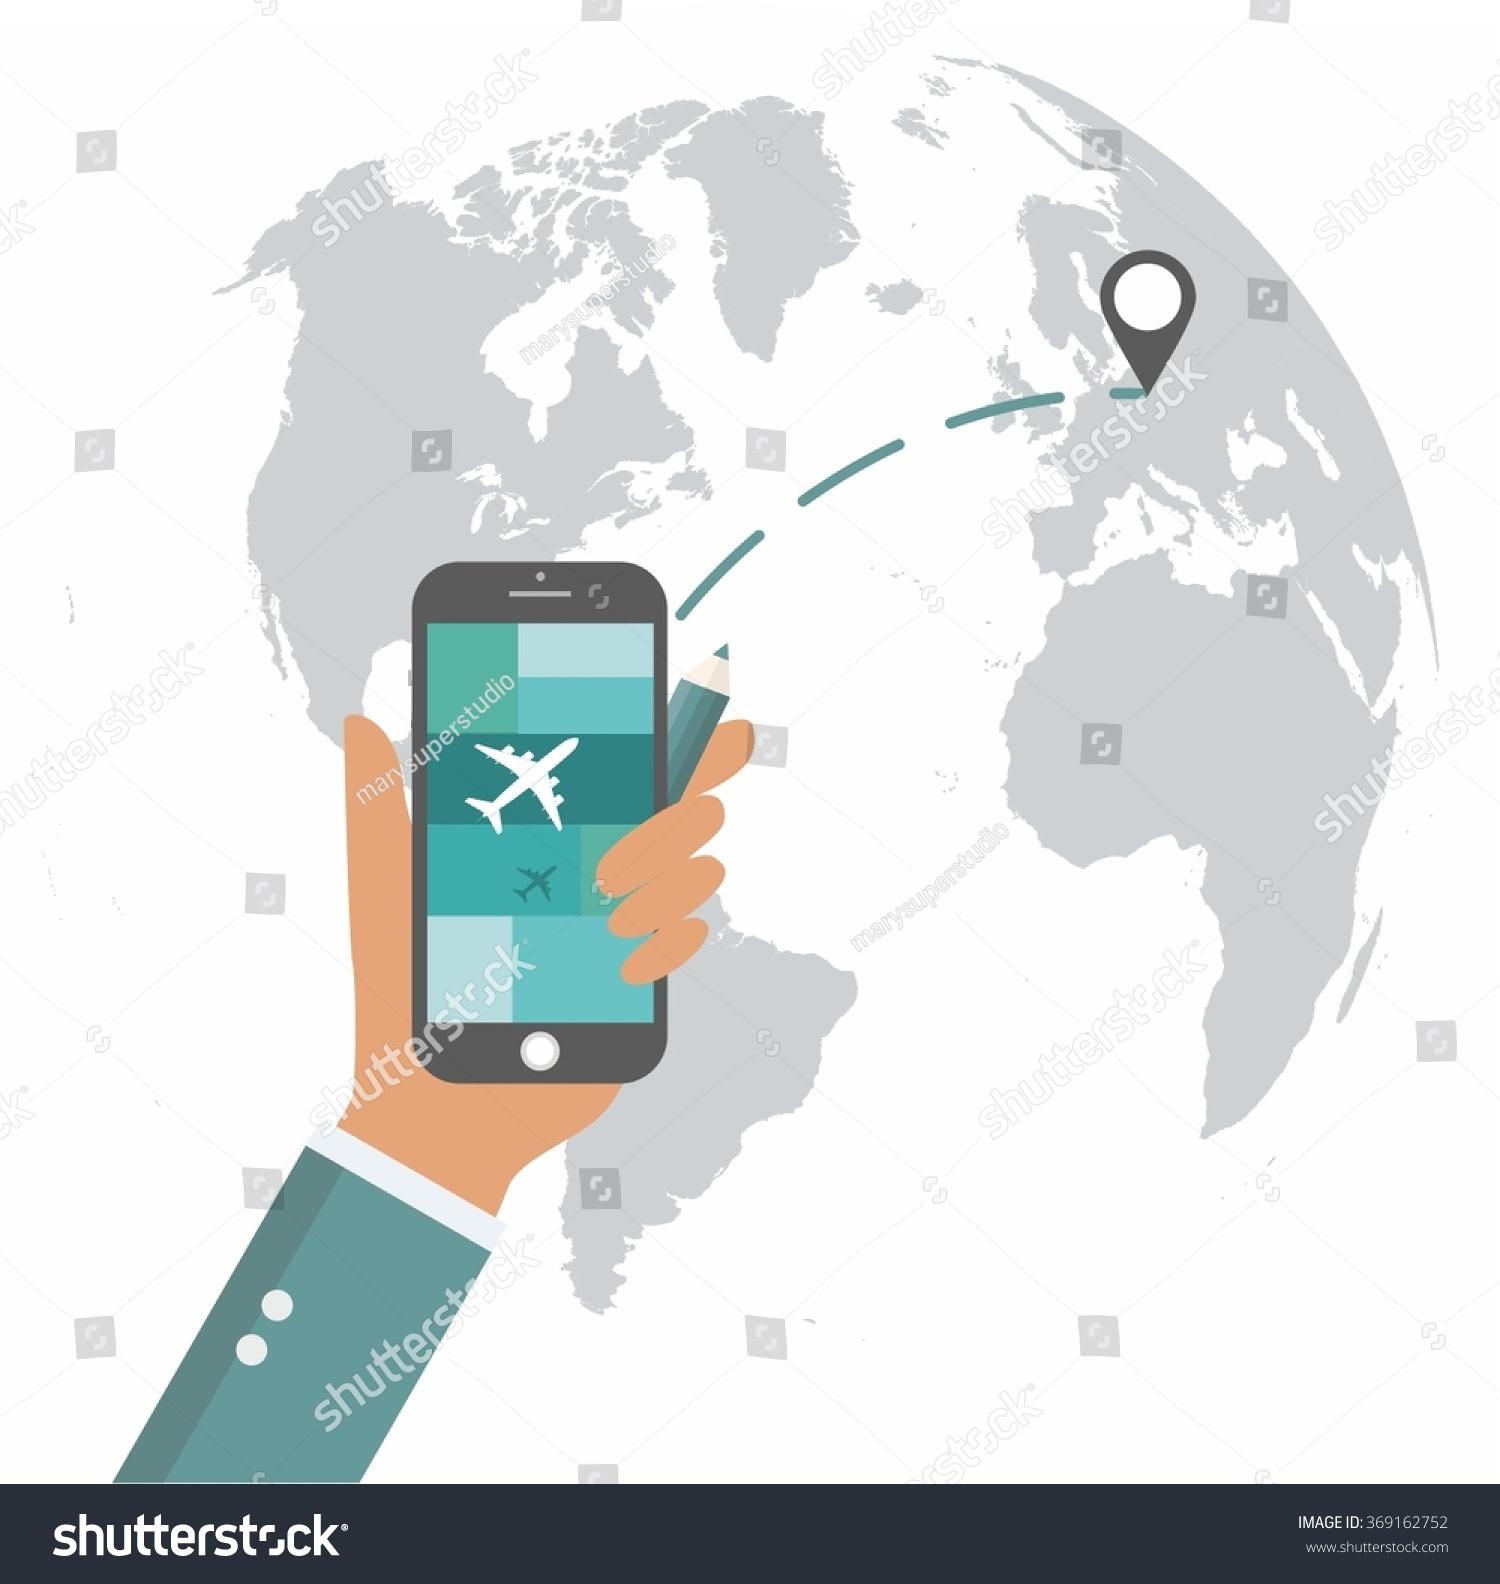 Flat design travel app mobile ui vectores en stock 369162752 flat design travel app mobile ui mock up on trendy world map background gumiabroncs Choice Image